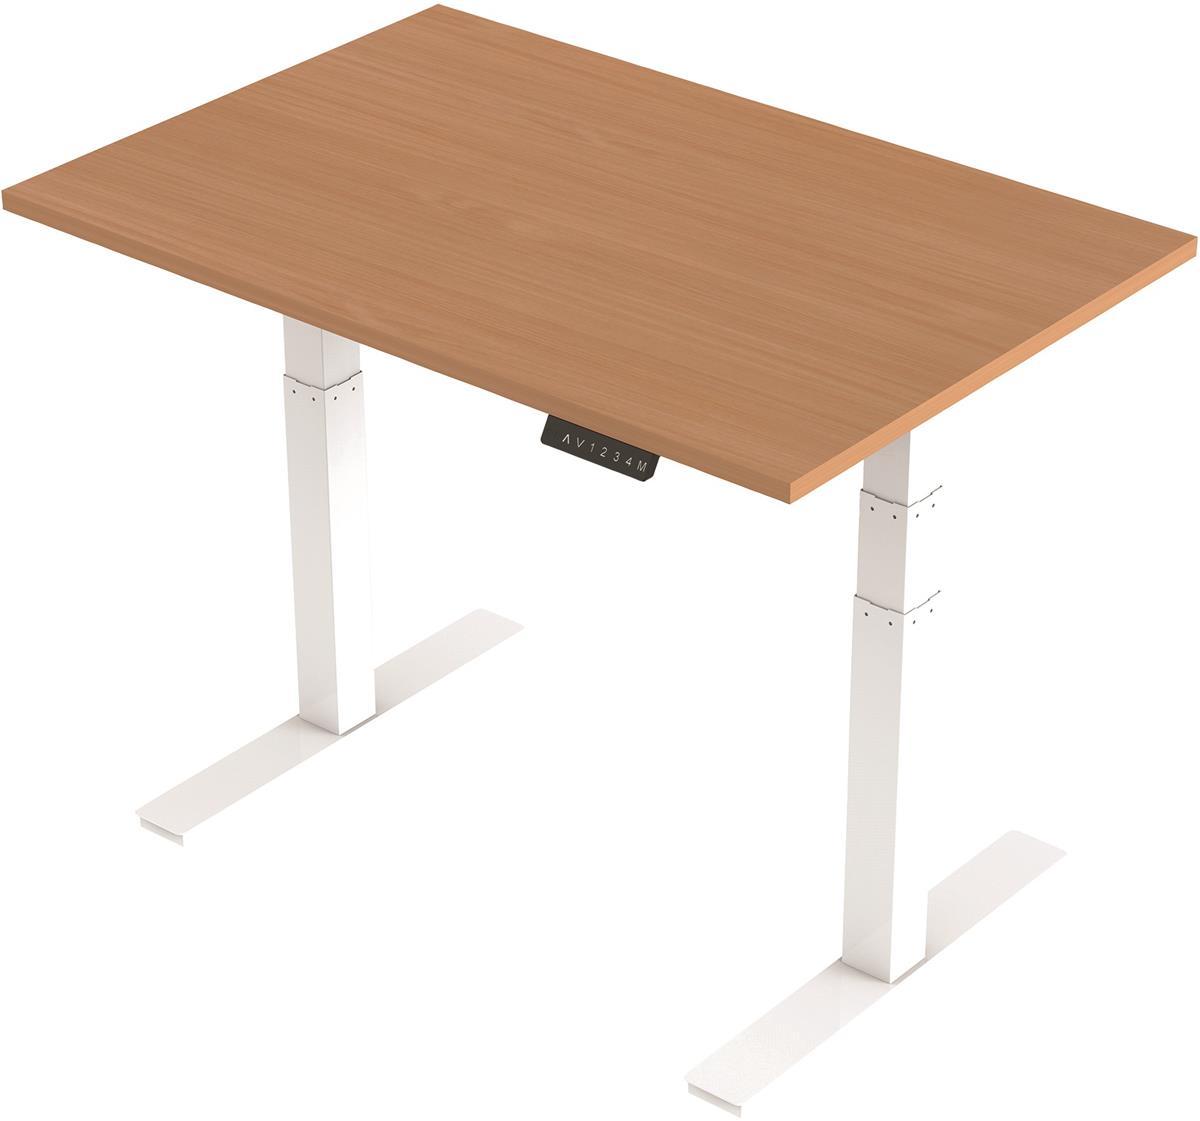 Image for Trexus Sit Stand Desk Height-adjustable White Leg Frame 1200mm Beech